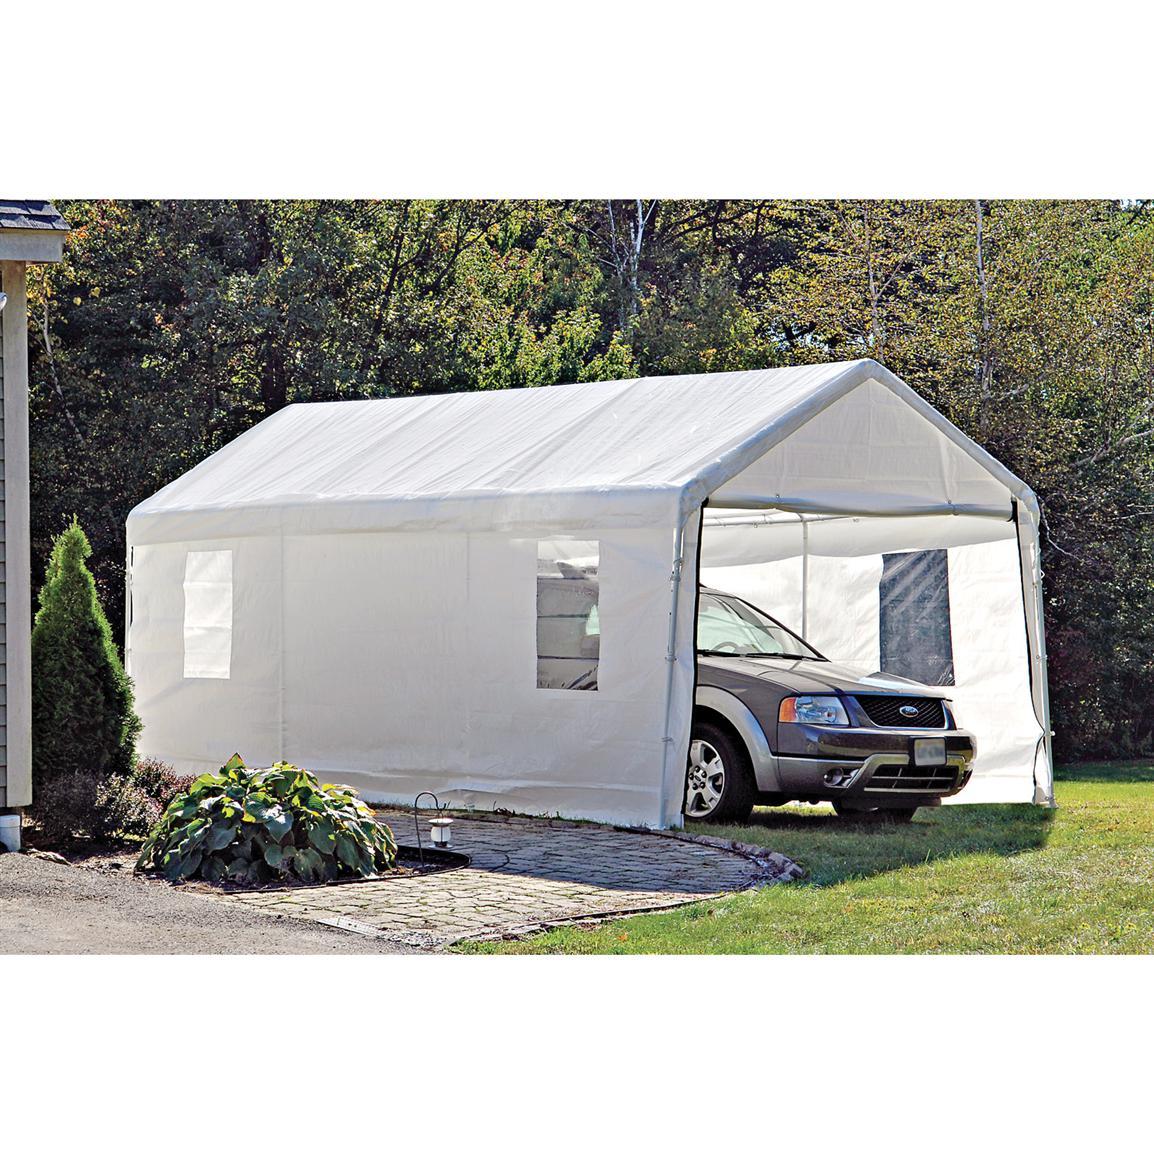 portable carport shelterlogic portable garage canopy carport, 10u0027 x 20u0027, white cover KKFIGZQ